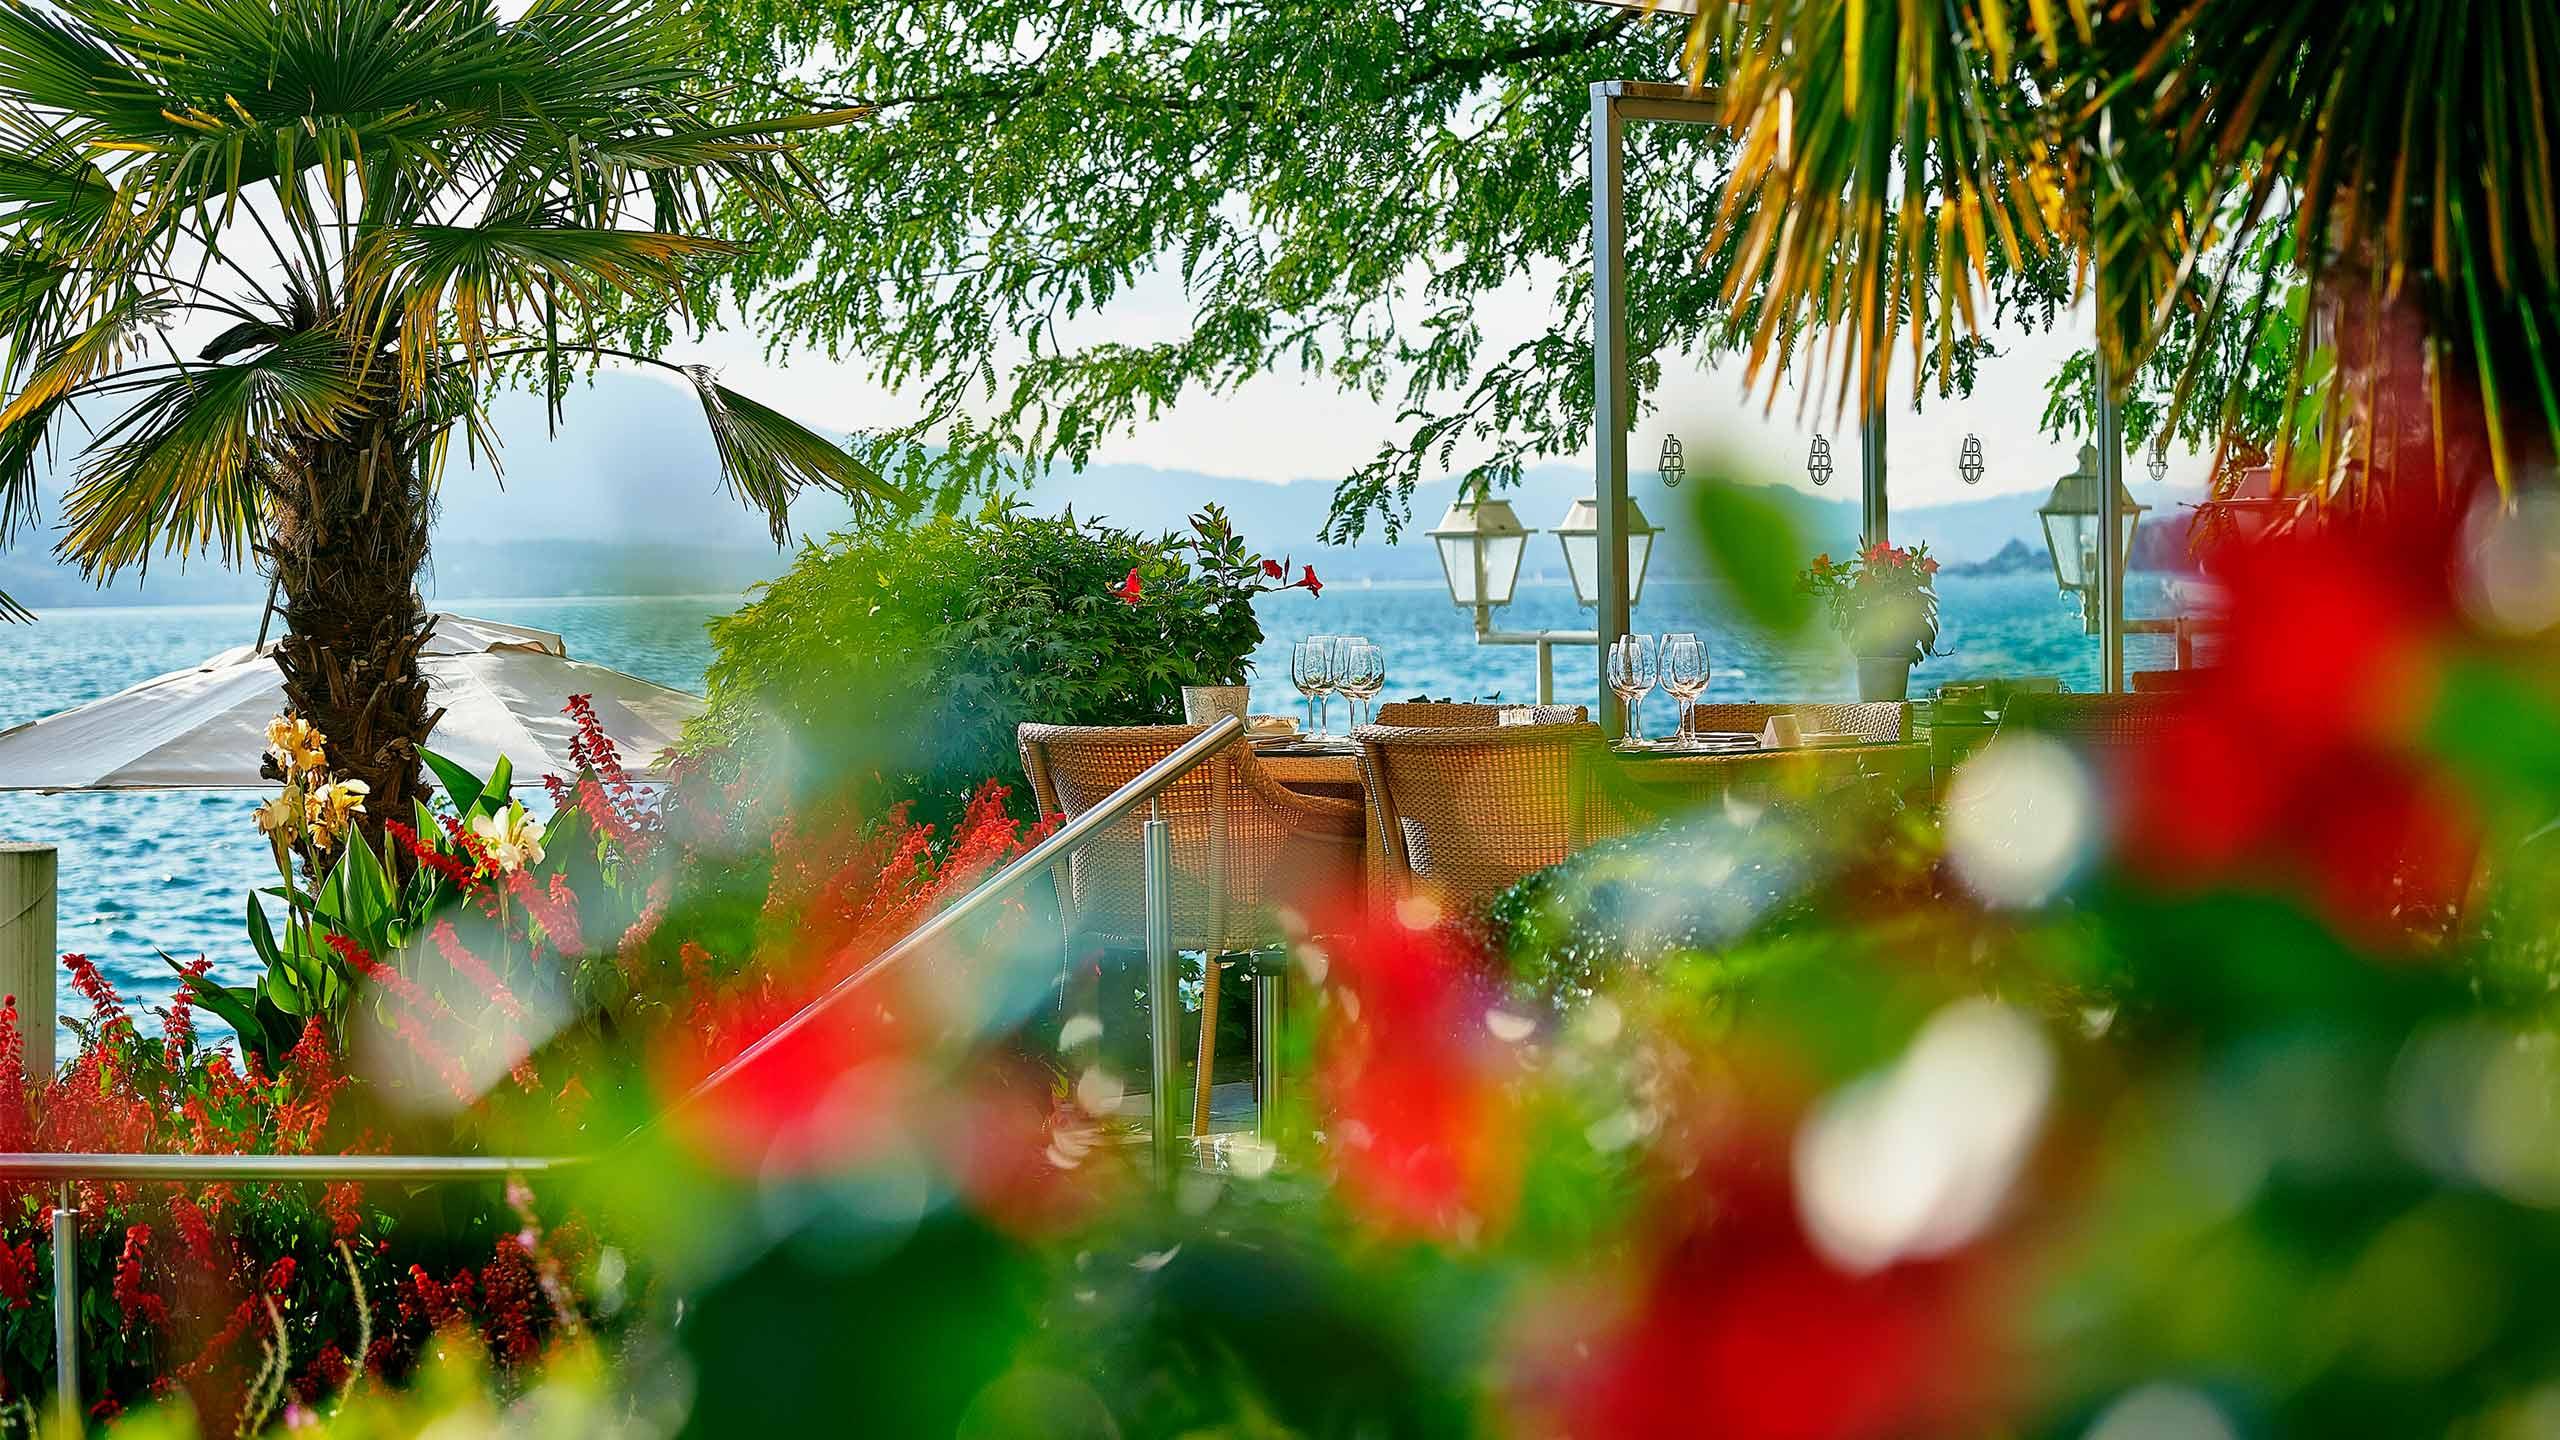 beatus-orangerie-piano-bar-terrasse-sommer-thunersee-pflanzen.jpg